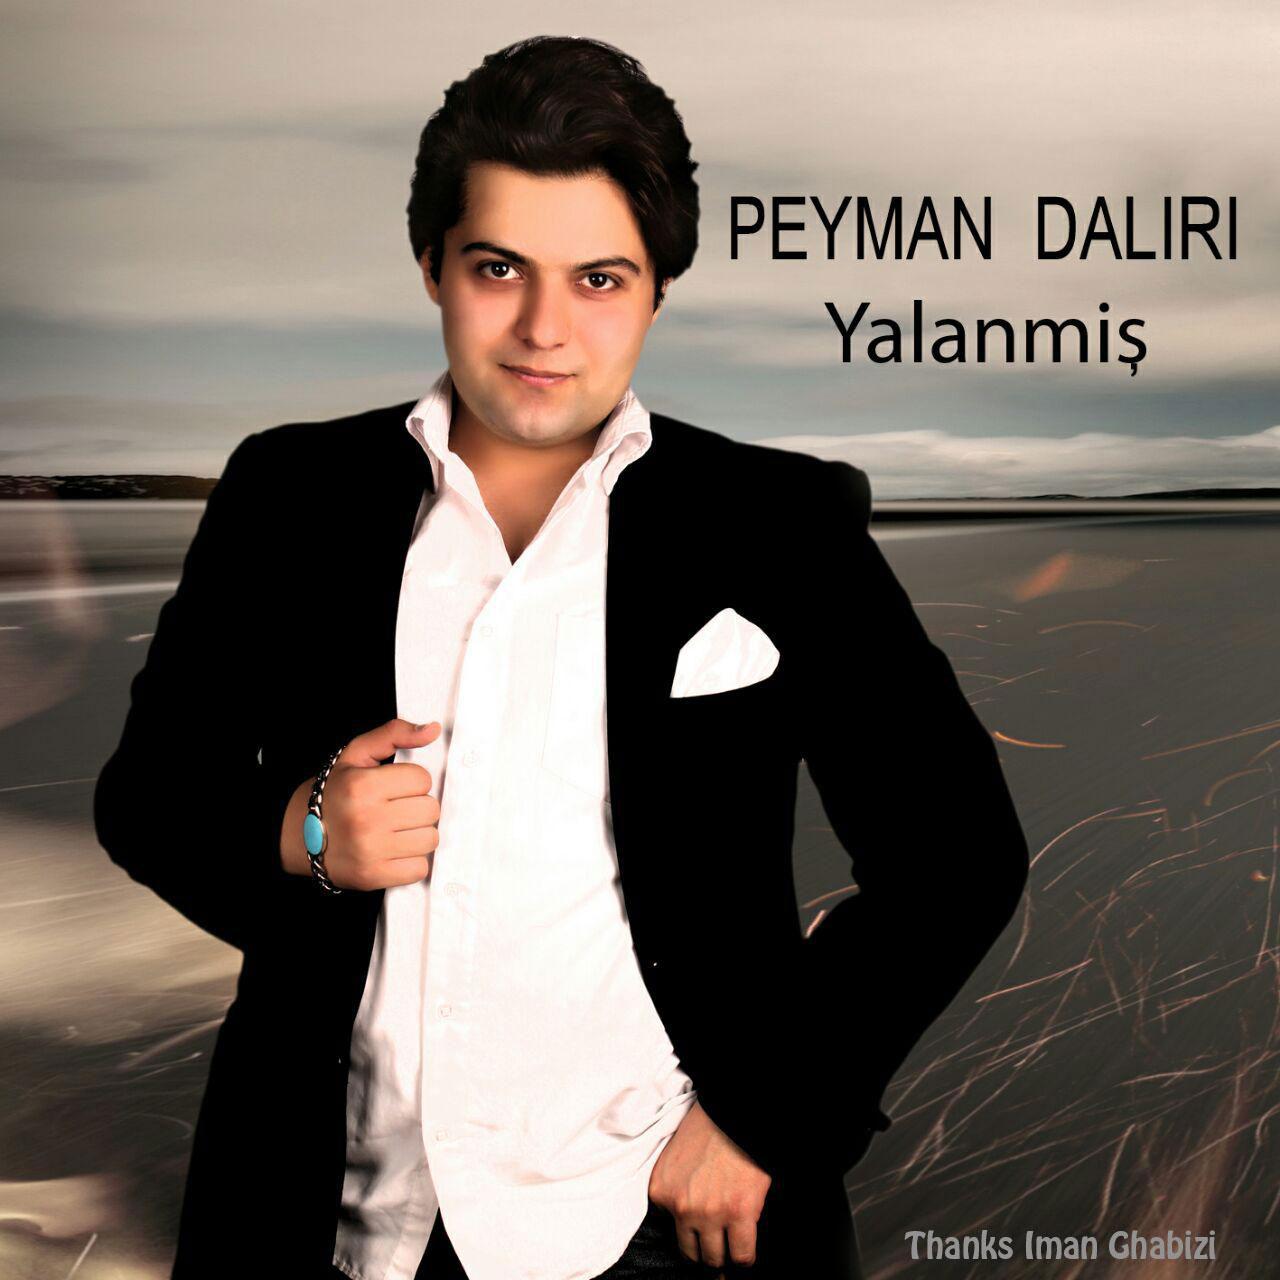 http://s8.picofile.com/file/8317481800/37Peyman_Daliri_Yalanmis.jpg